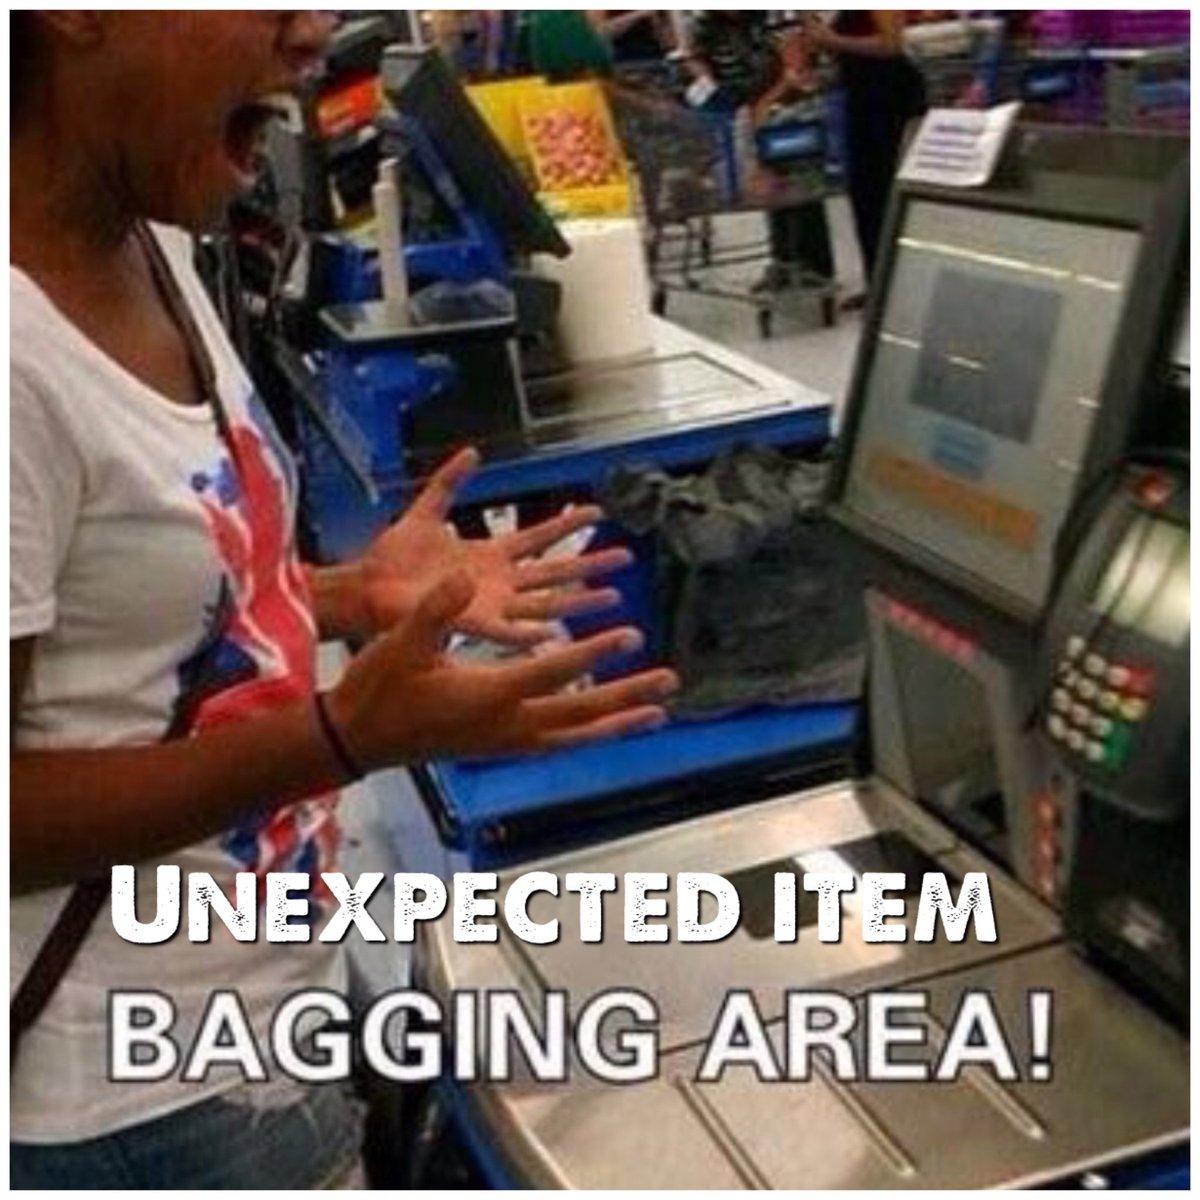 Unexpected item, Bagging area #ScareTheEnglishIn4Words